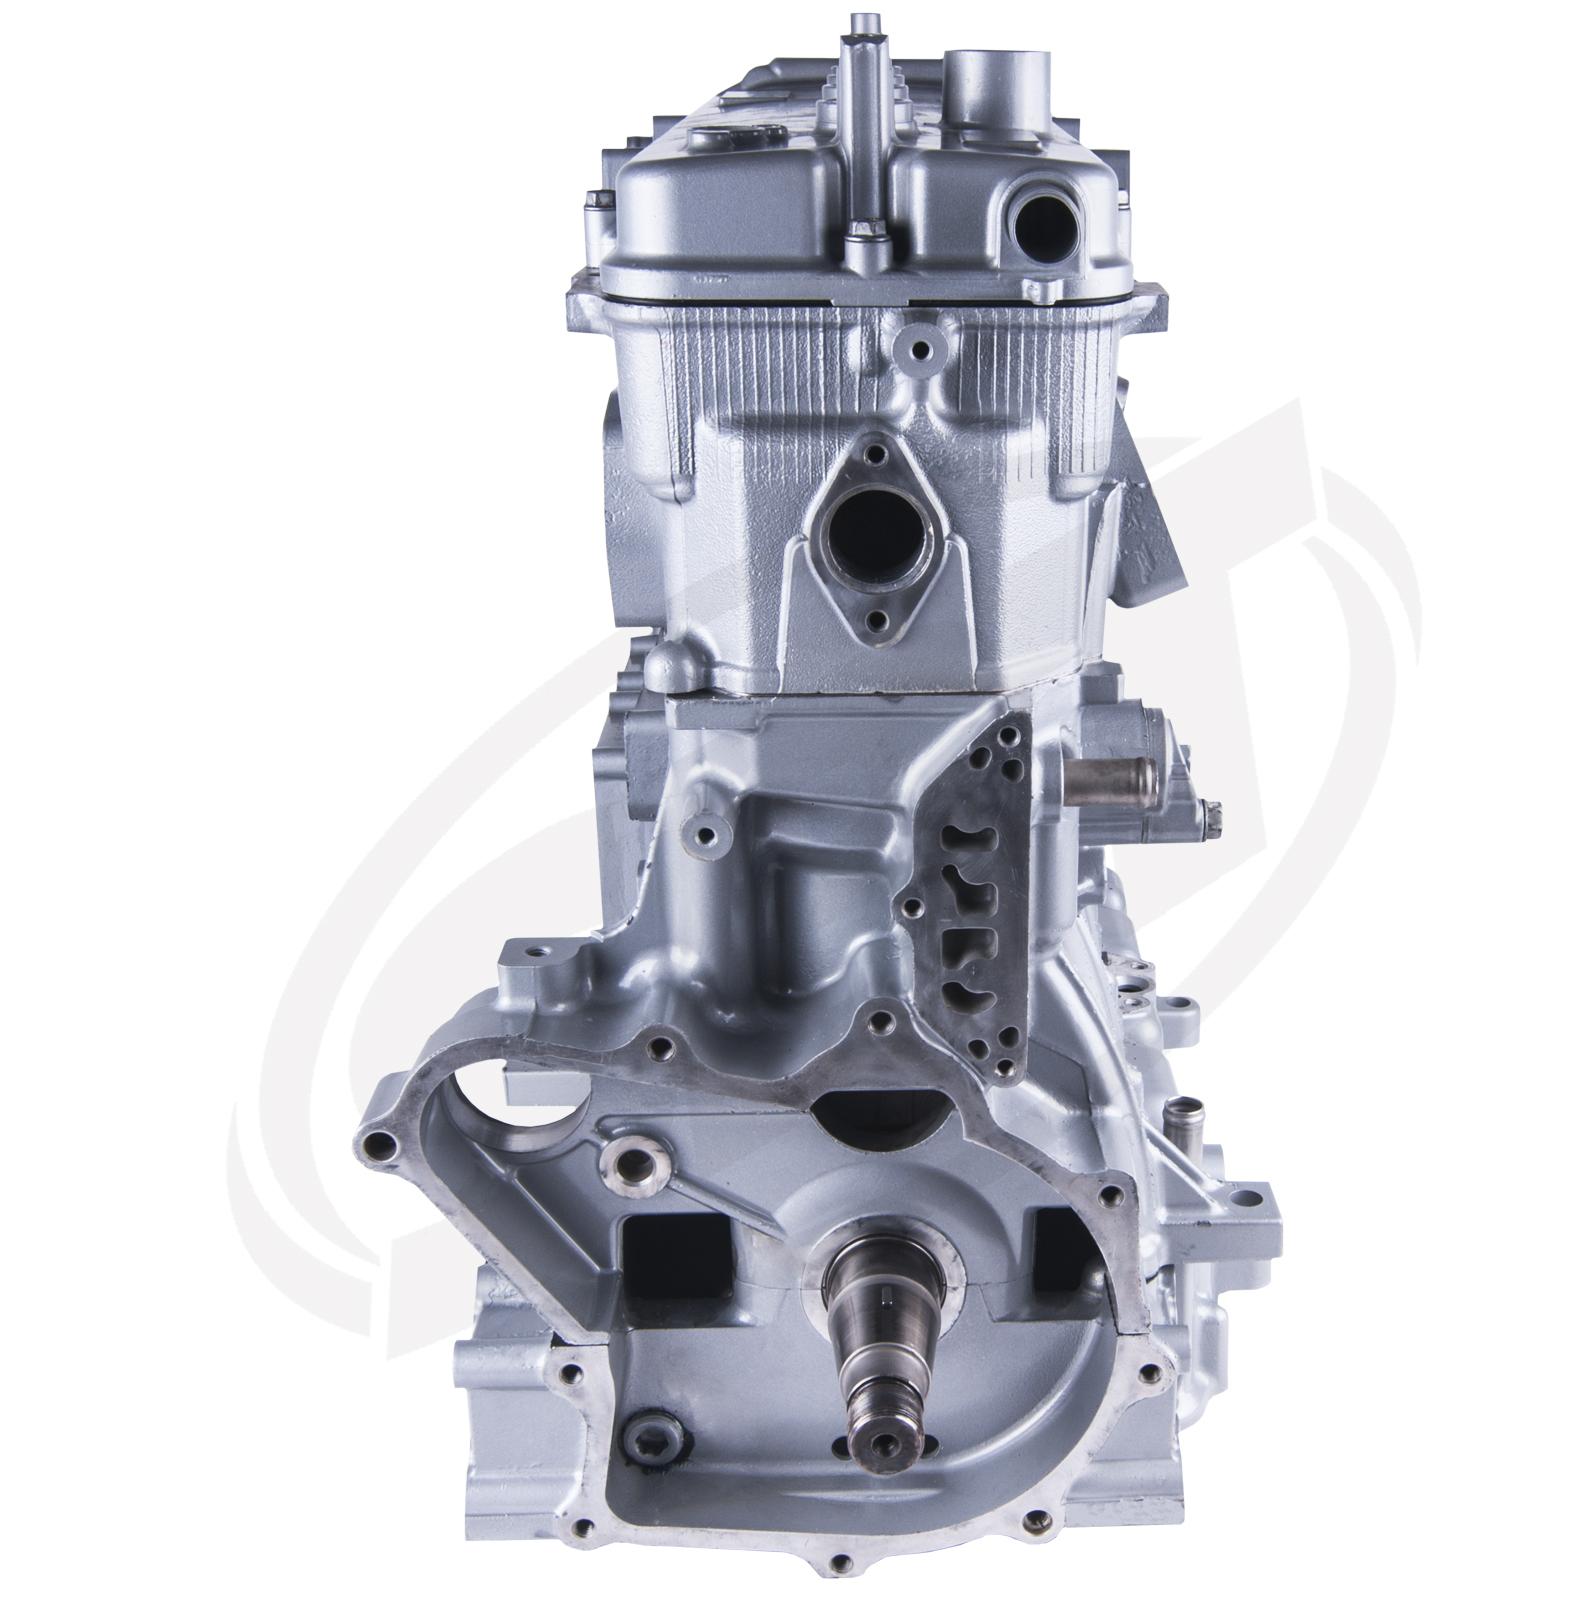 YAMAHA OEM Impeller Pump Housing NEW FZS FZR FX-HO FX-SHO VXR VXS GP1300R GP800R